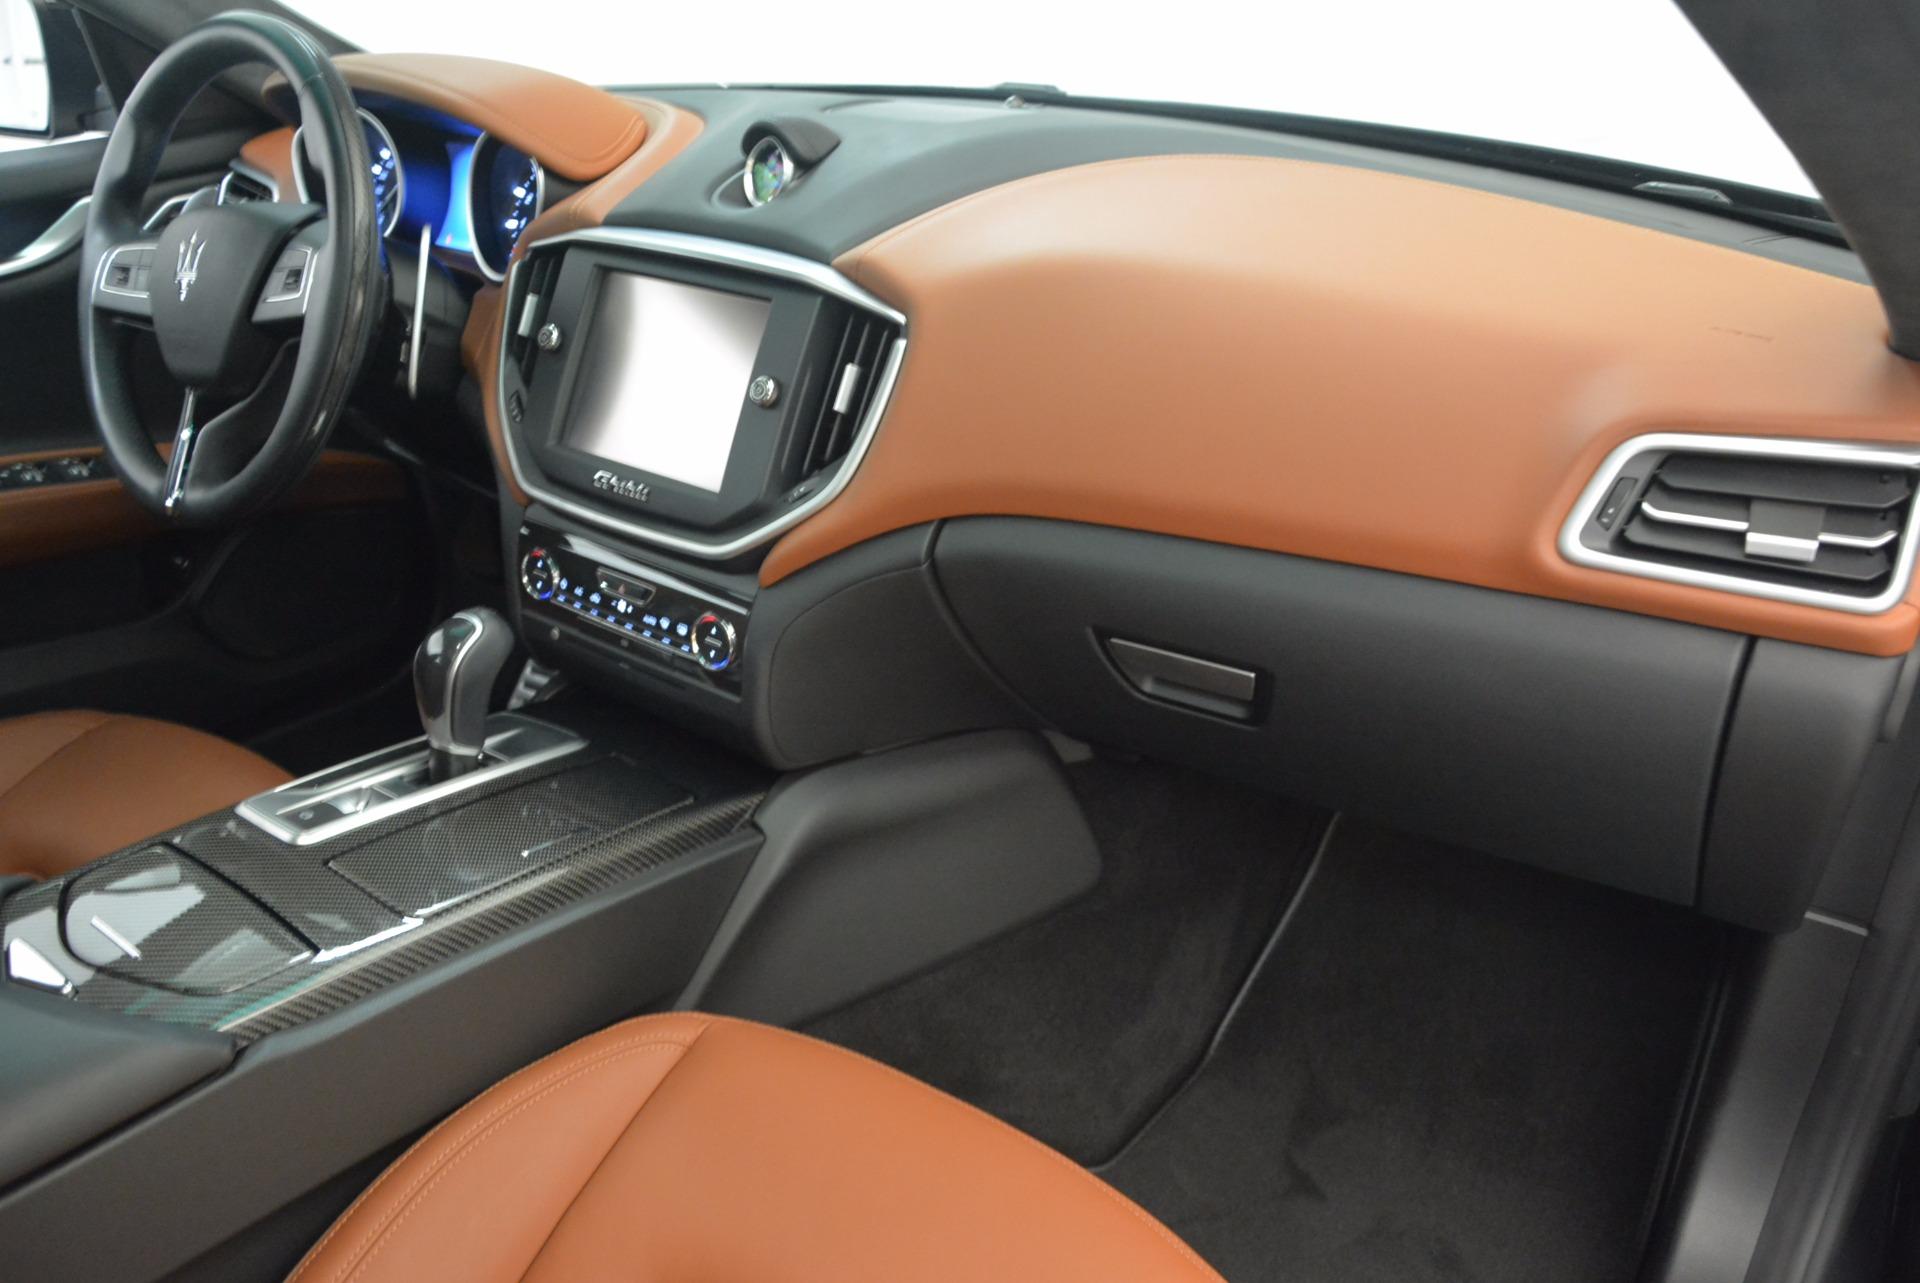 Used 2014 Maserati Ghibli S Q4 For Sale In Greenwich, CT. Alfa Romeo of Greenwich, 7281 1587_p23